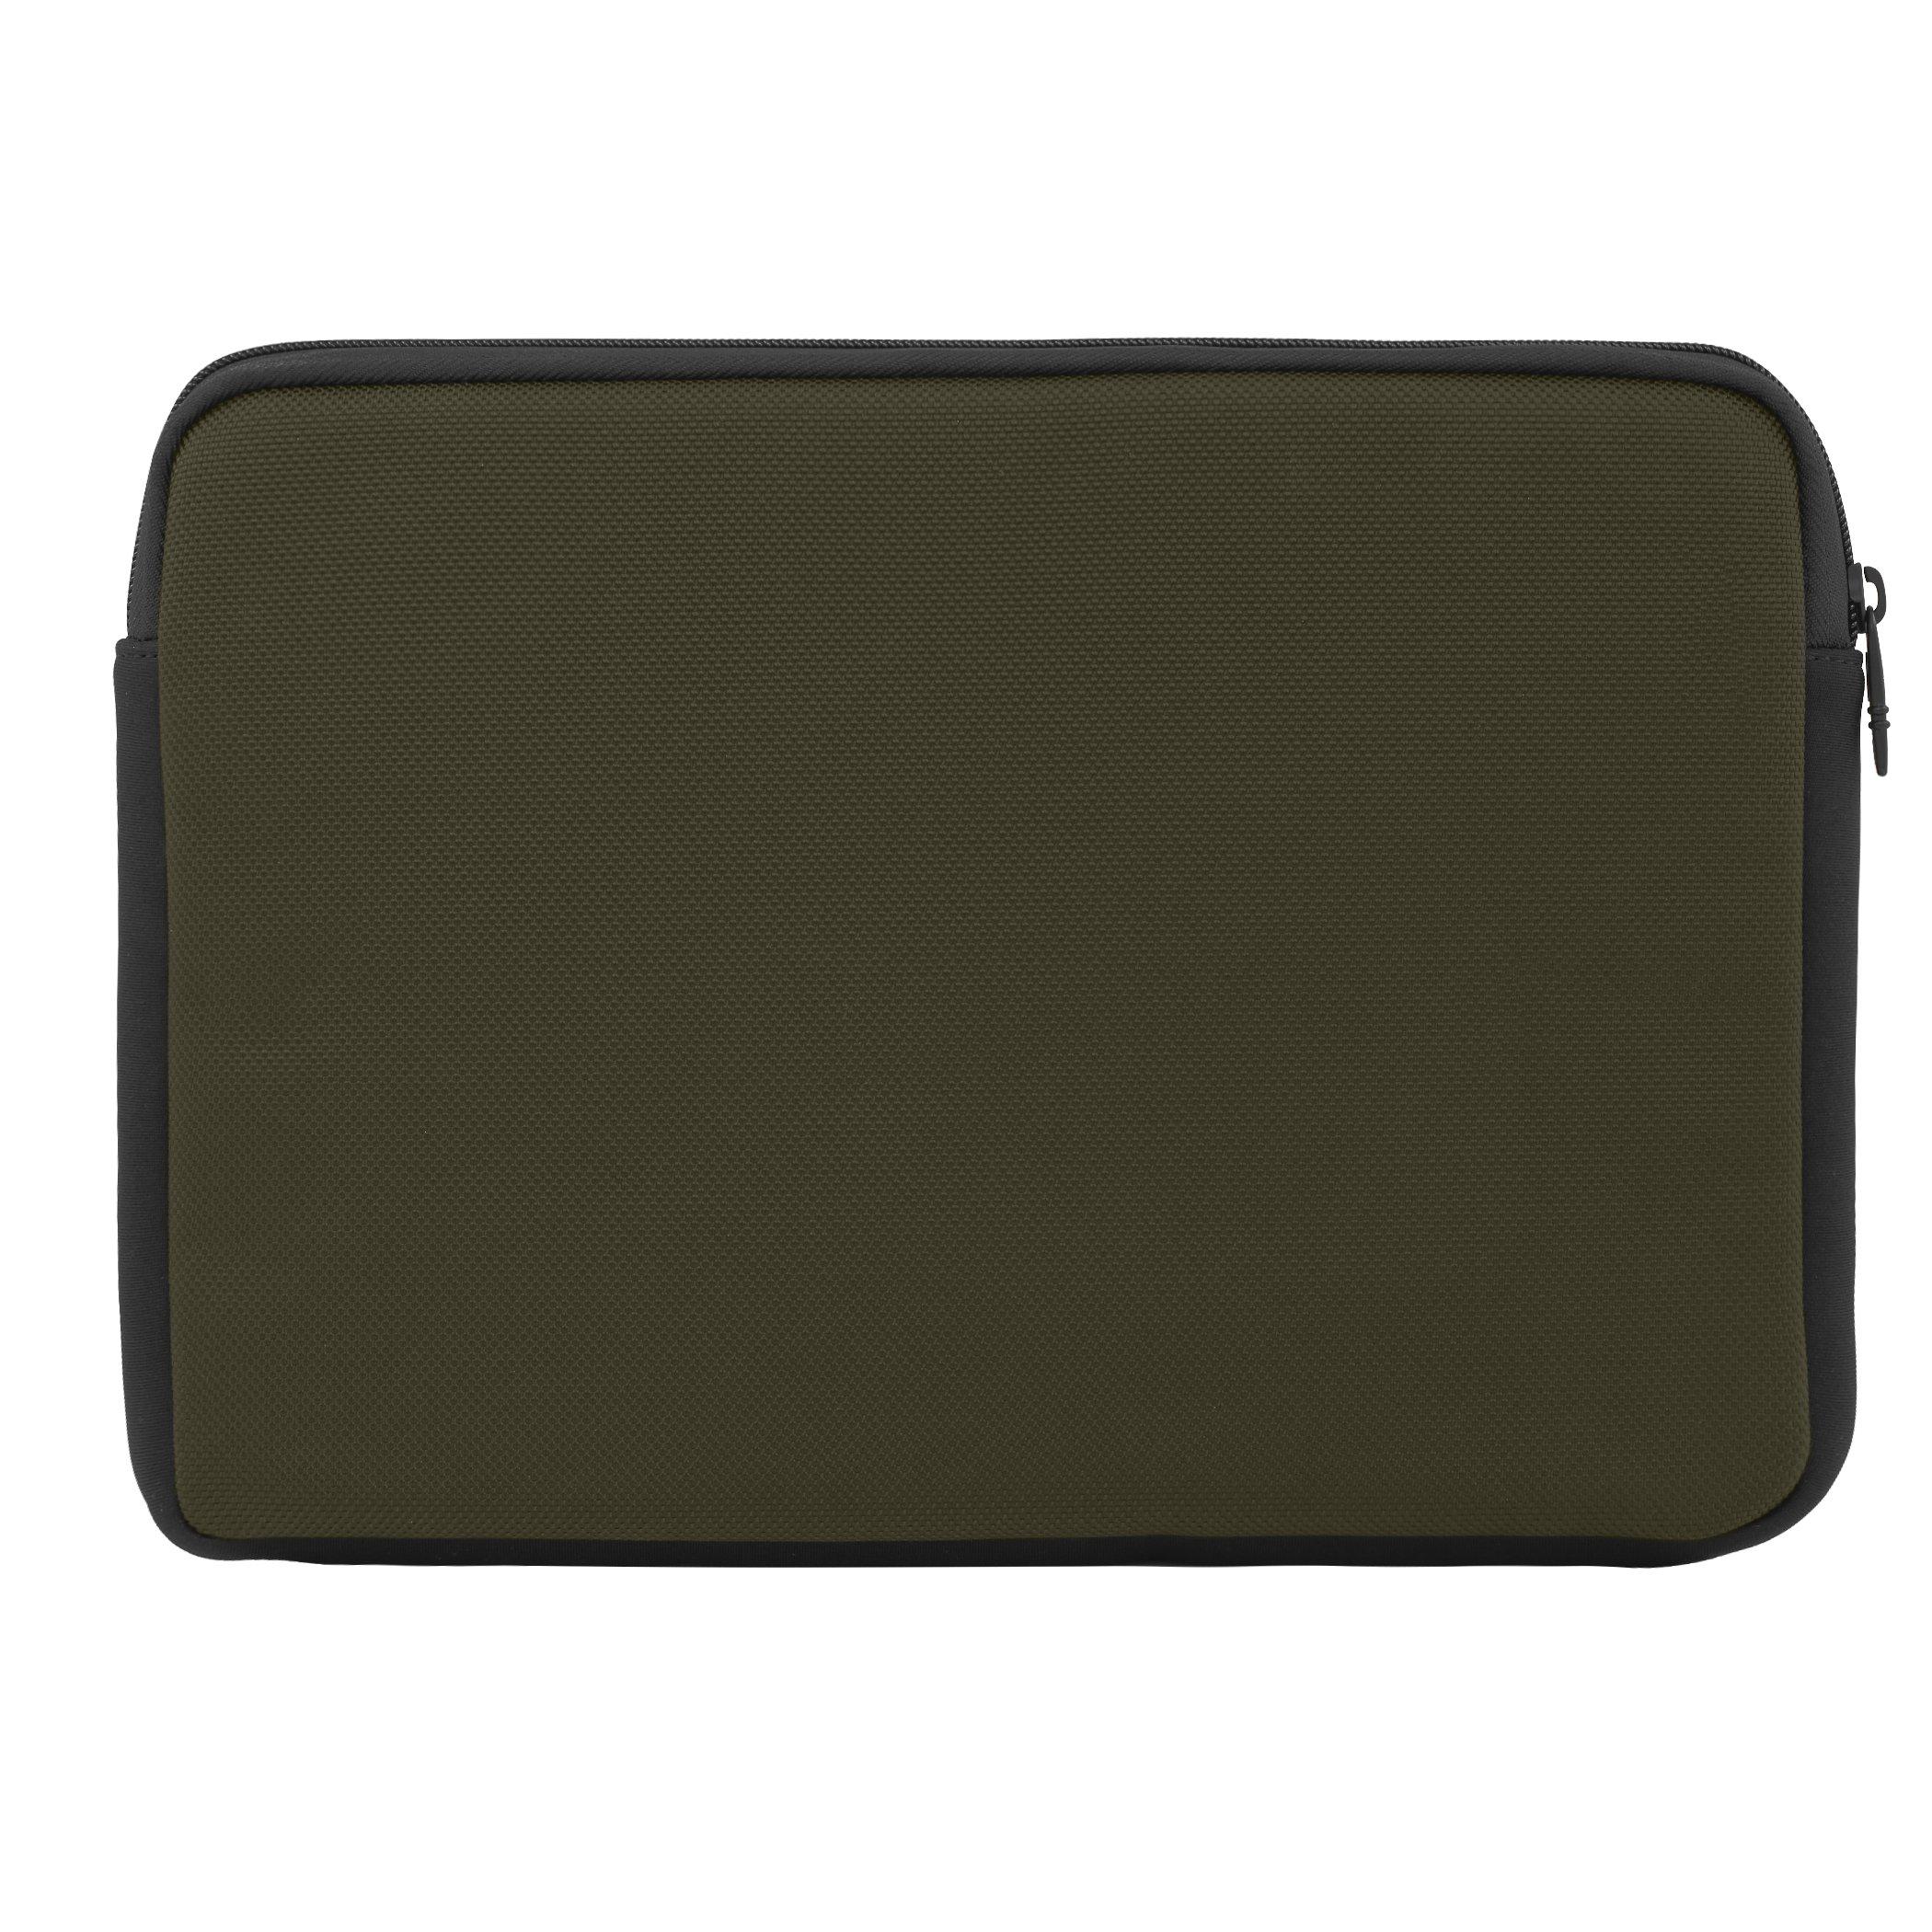 TUMI Laptop Cover for 13'' Laptops - Ballistic Nylon Olive by Incipio (Image #2)